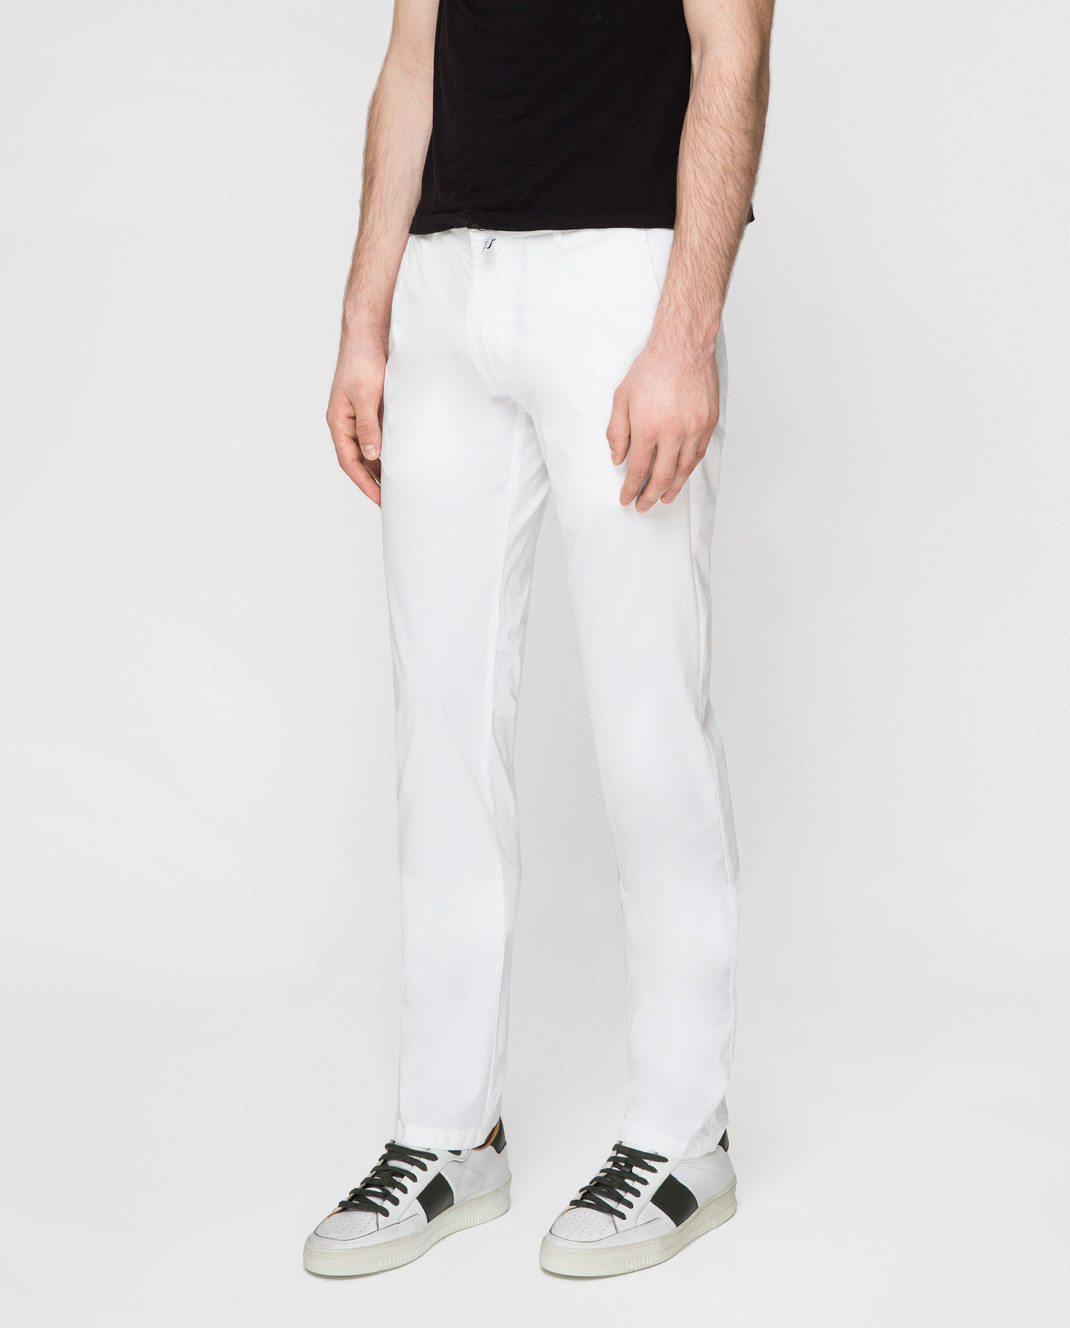 Kiton Белые брюки UPCAPRJ07R90 изображение 3